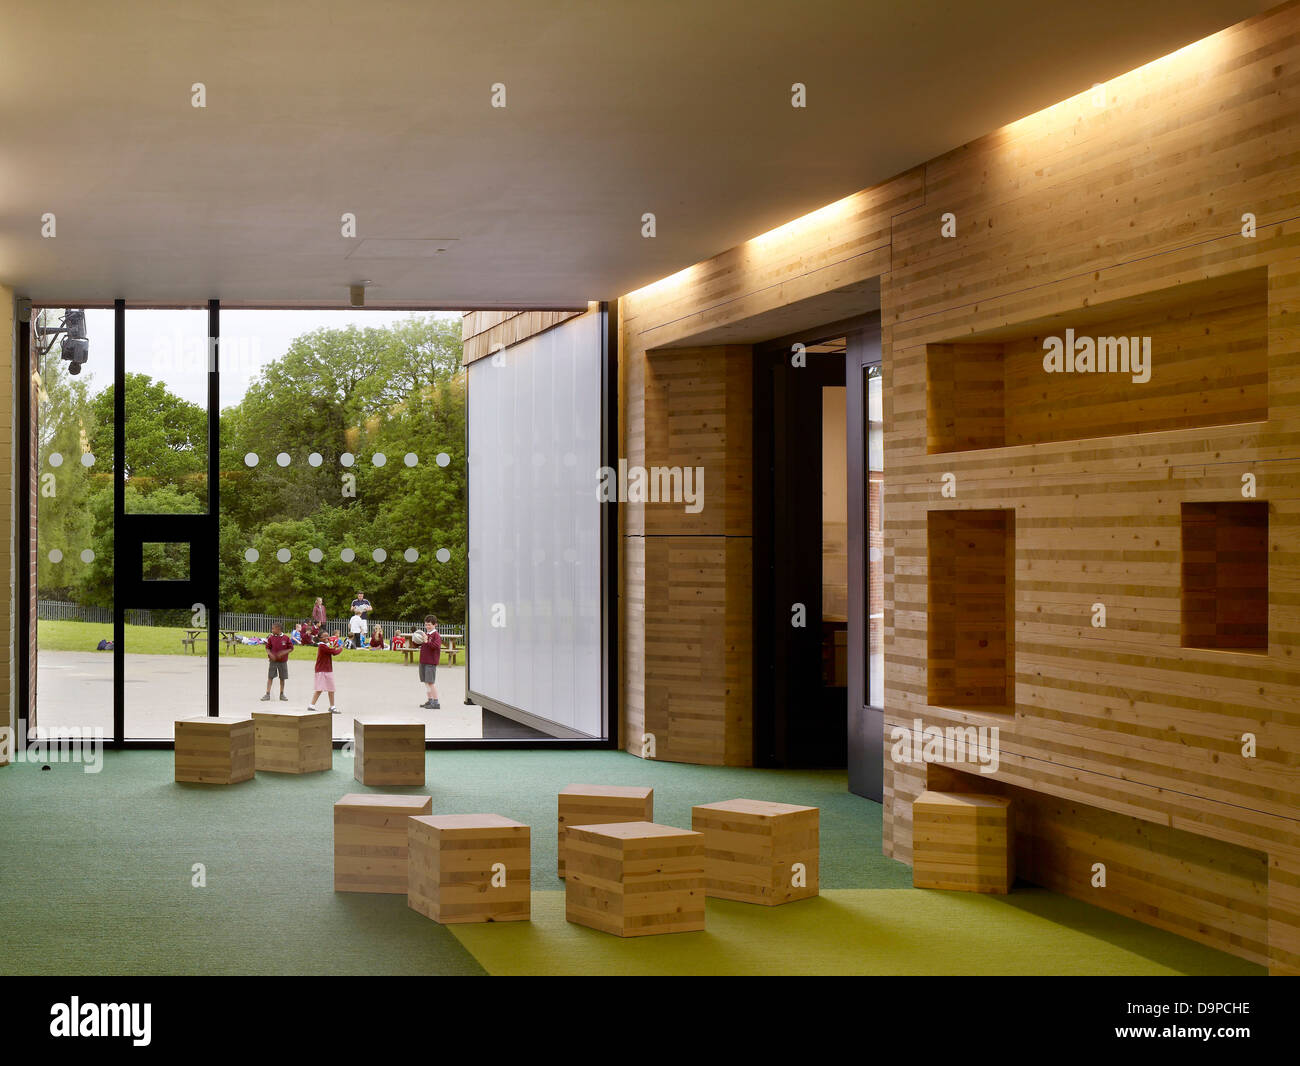 Hayes United Kingdom  City pictures : Hayes Primary School, Croydon, United Kingdom. Architect: Hayhurst ...